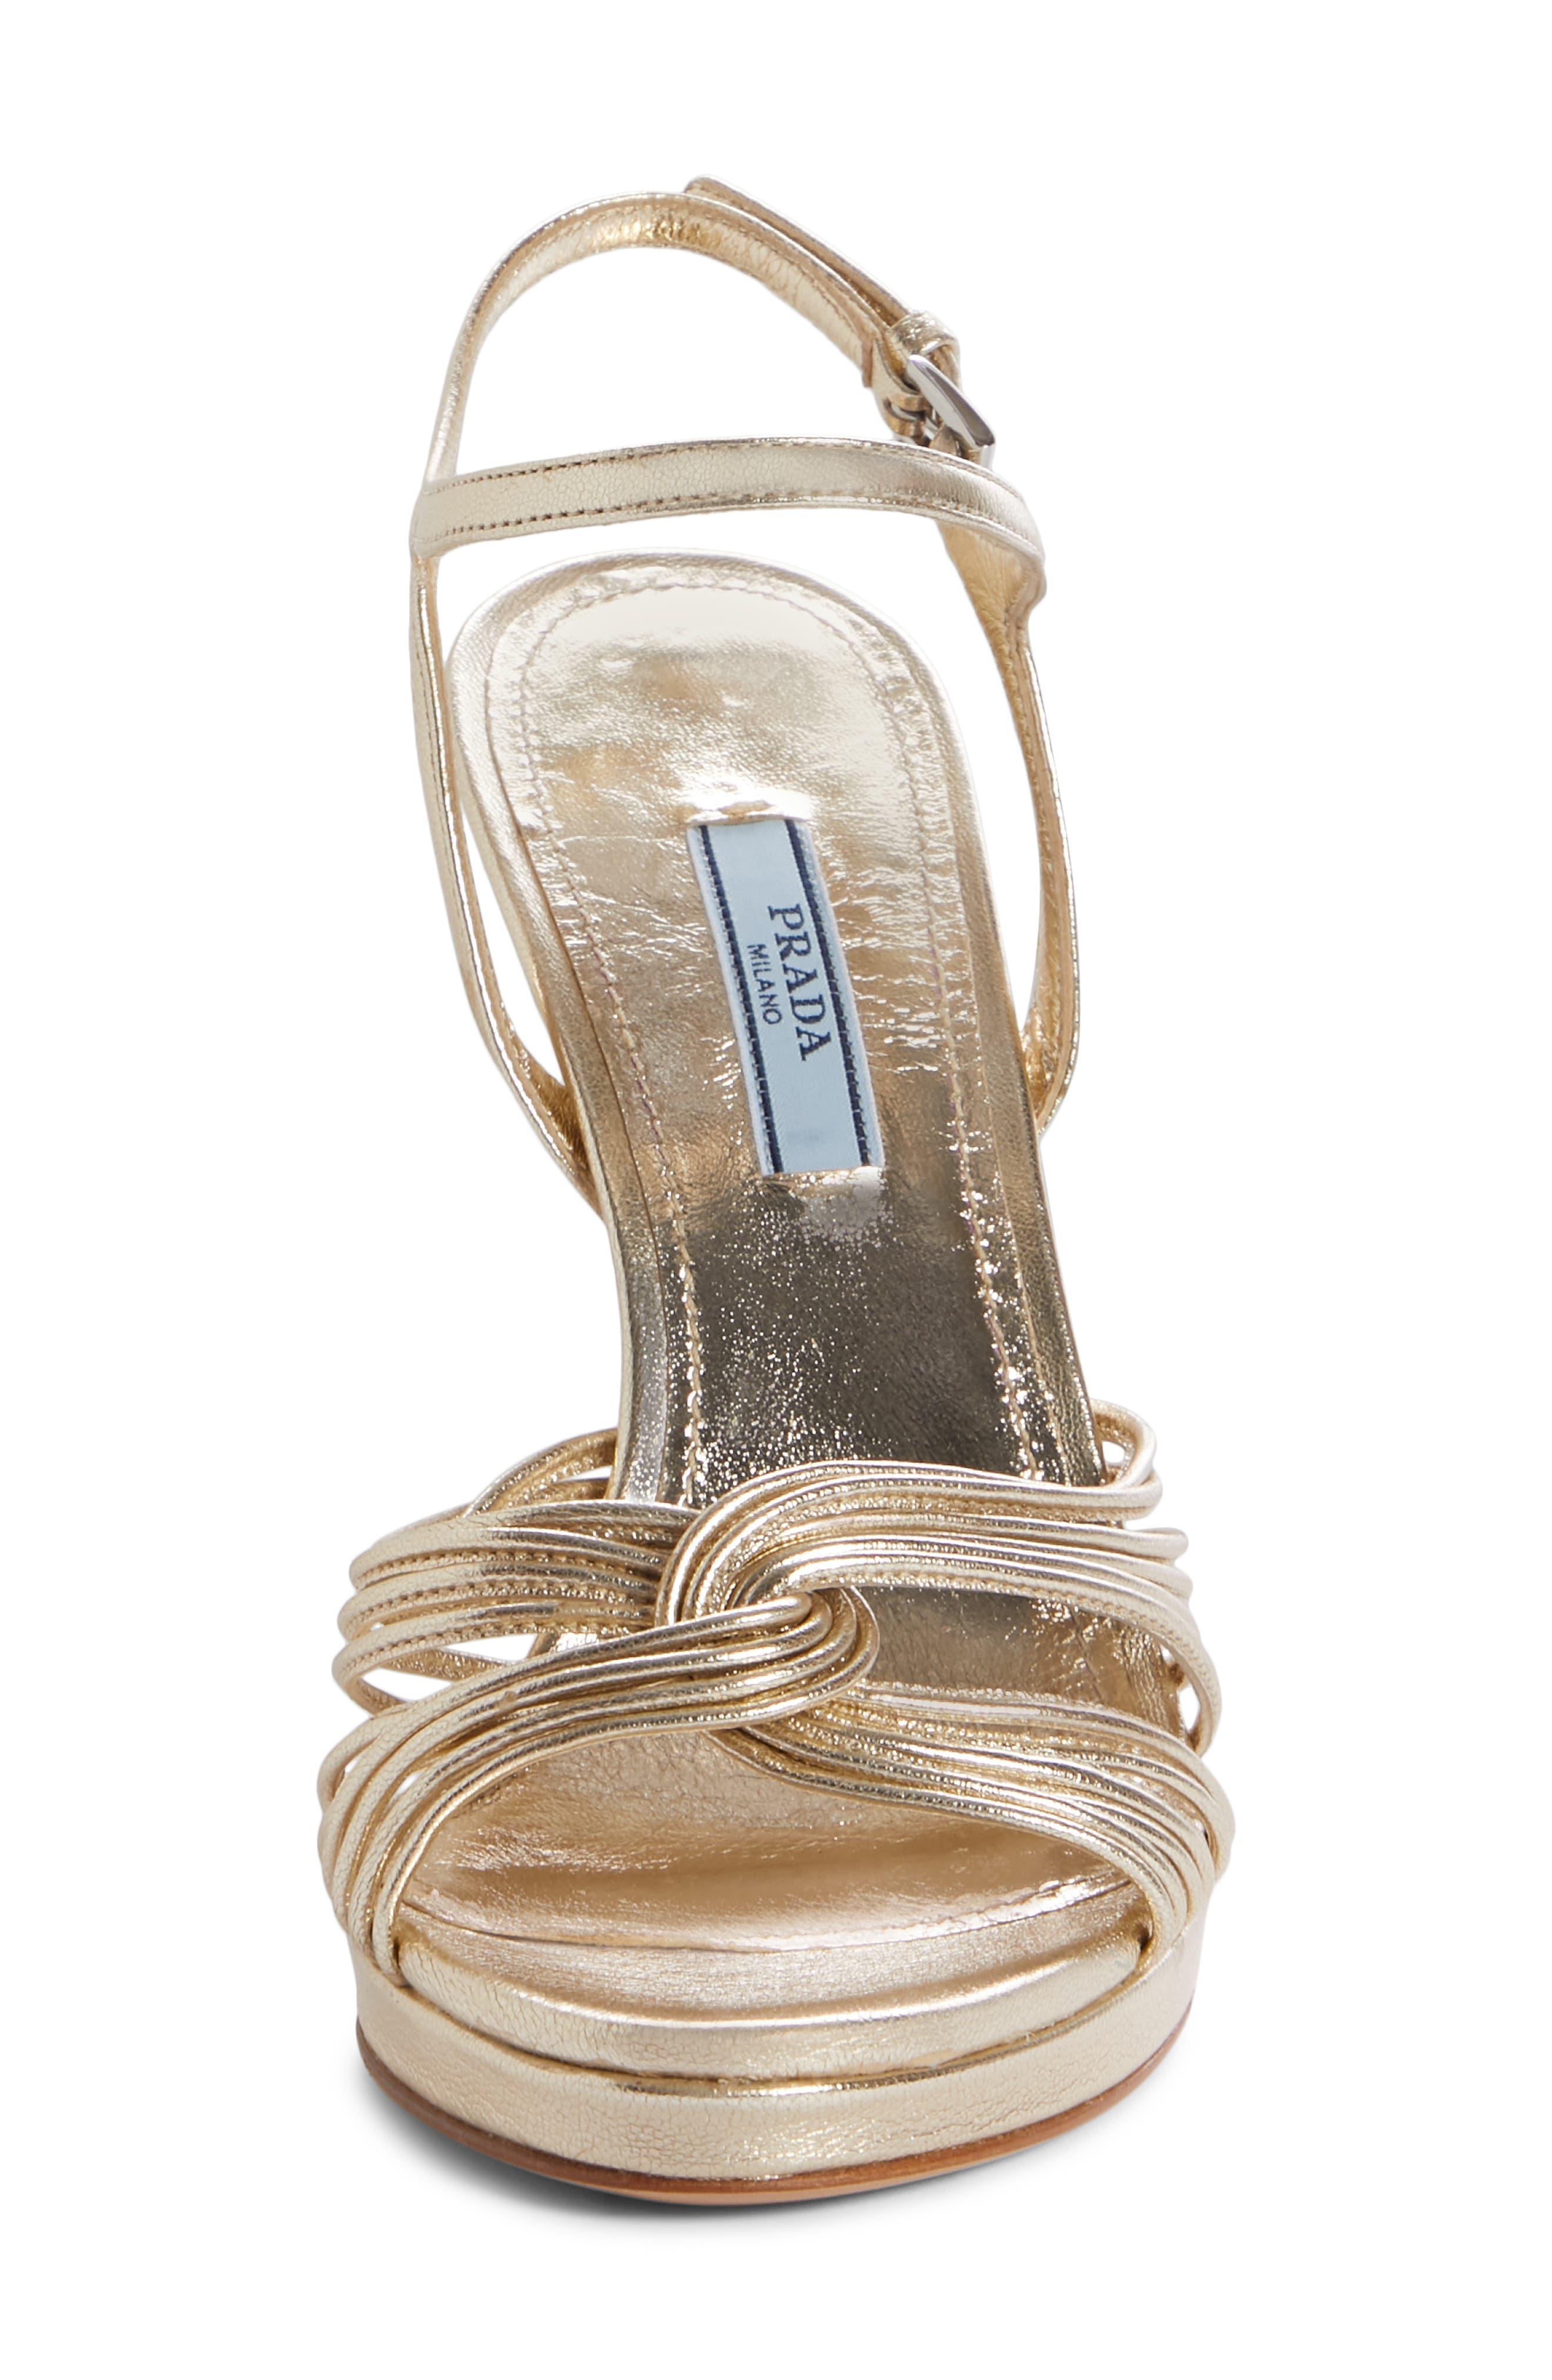 Roping Ankle Strap Sandal,                             Alternate thumbnail 4, color,                             PIRITE LEATHER